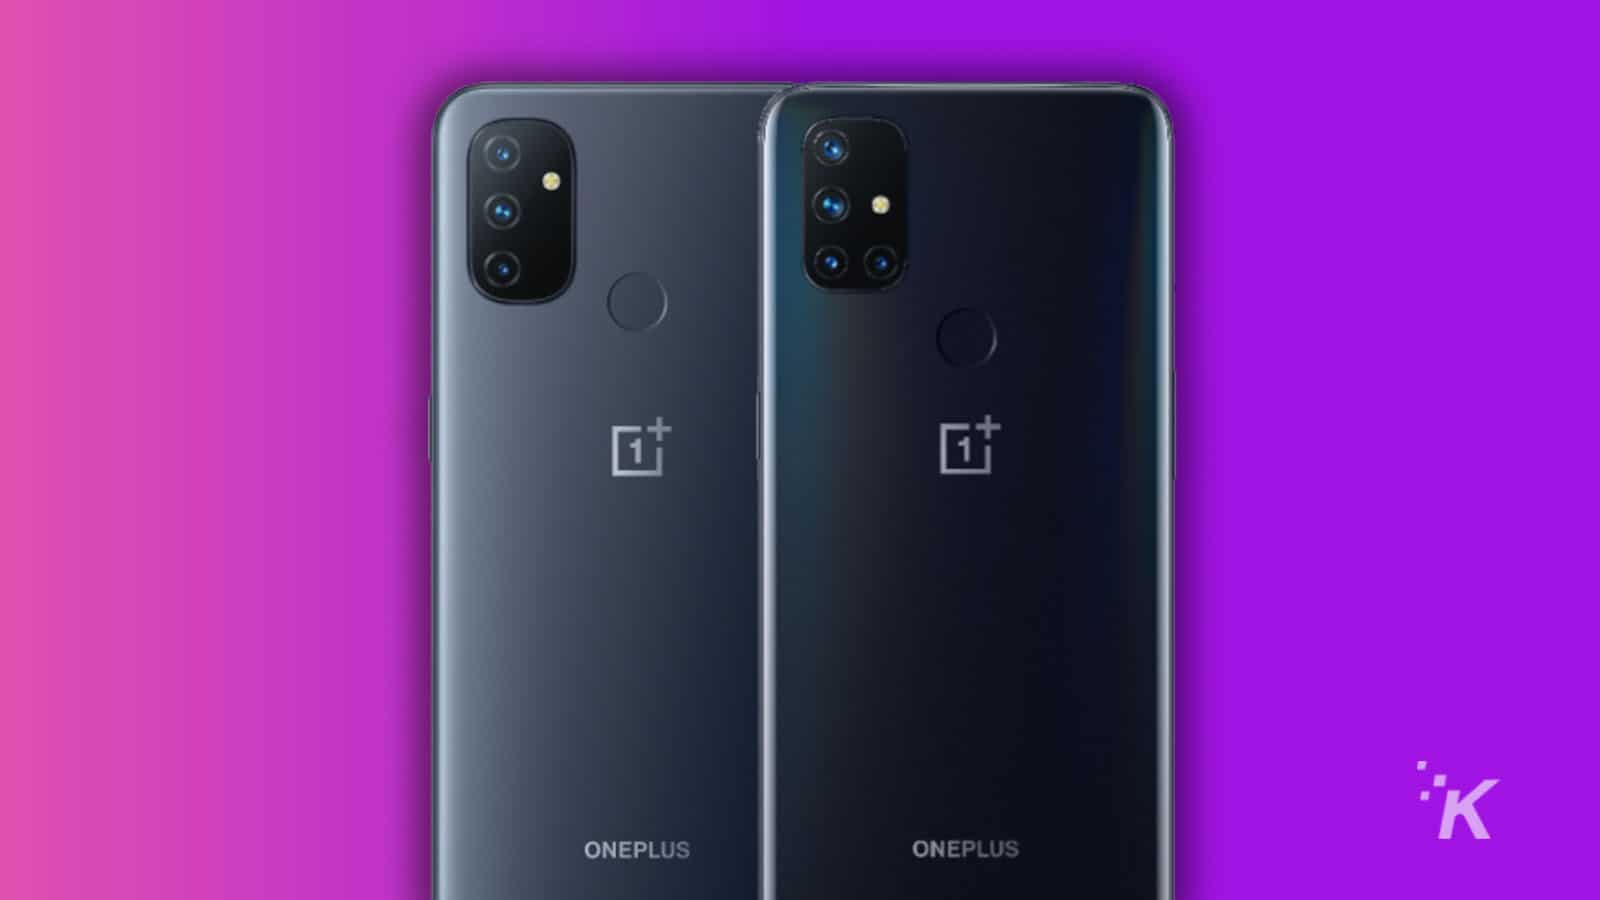 oneplus new smartphone